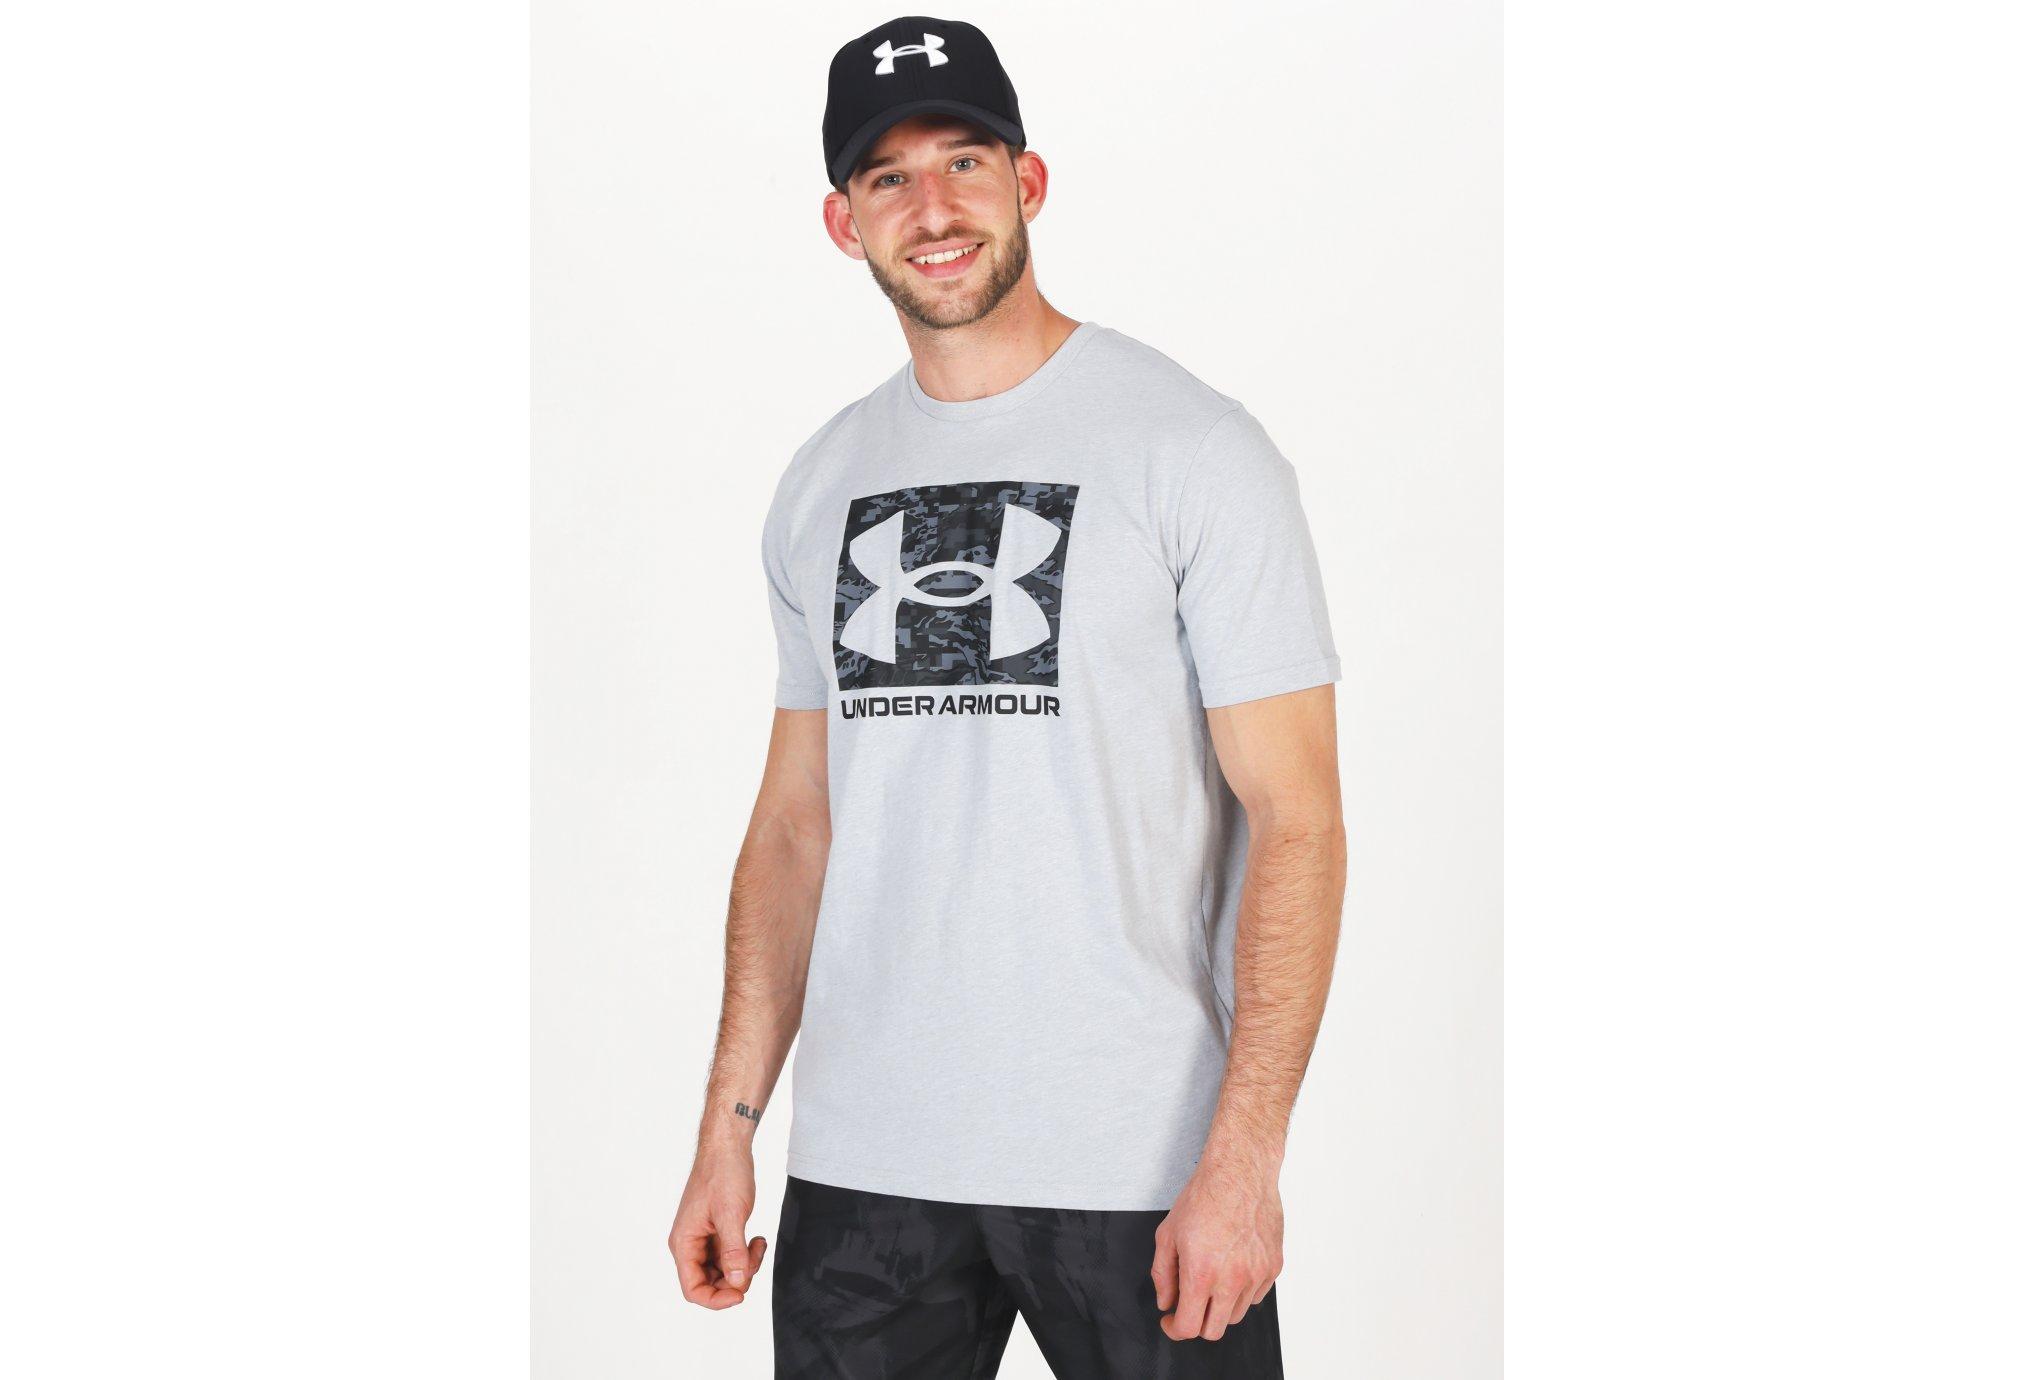 Under Armour ABC Camo Boxed Logo M vêtement running homme